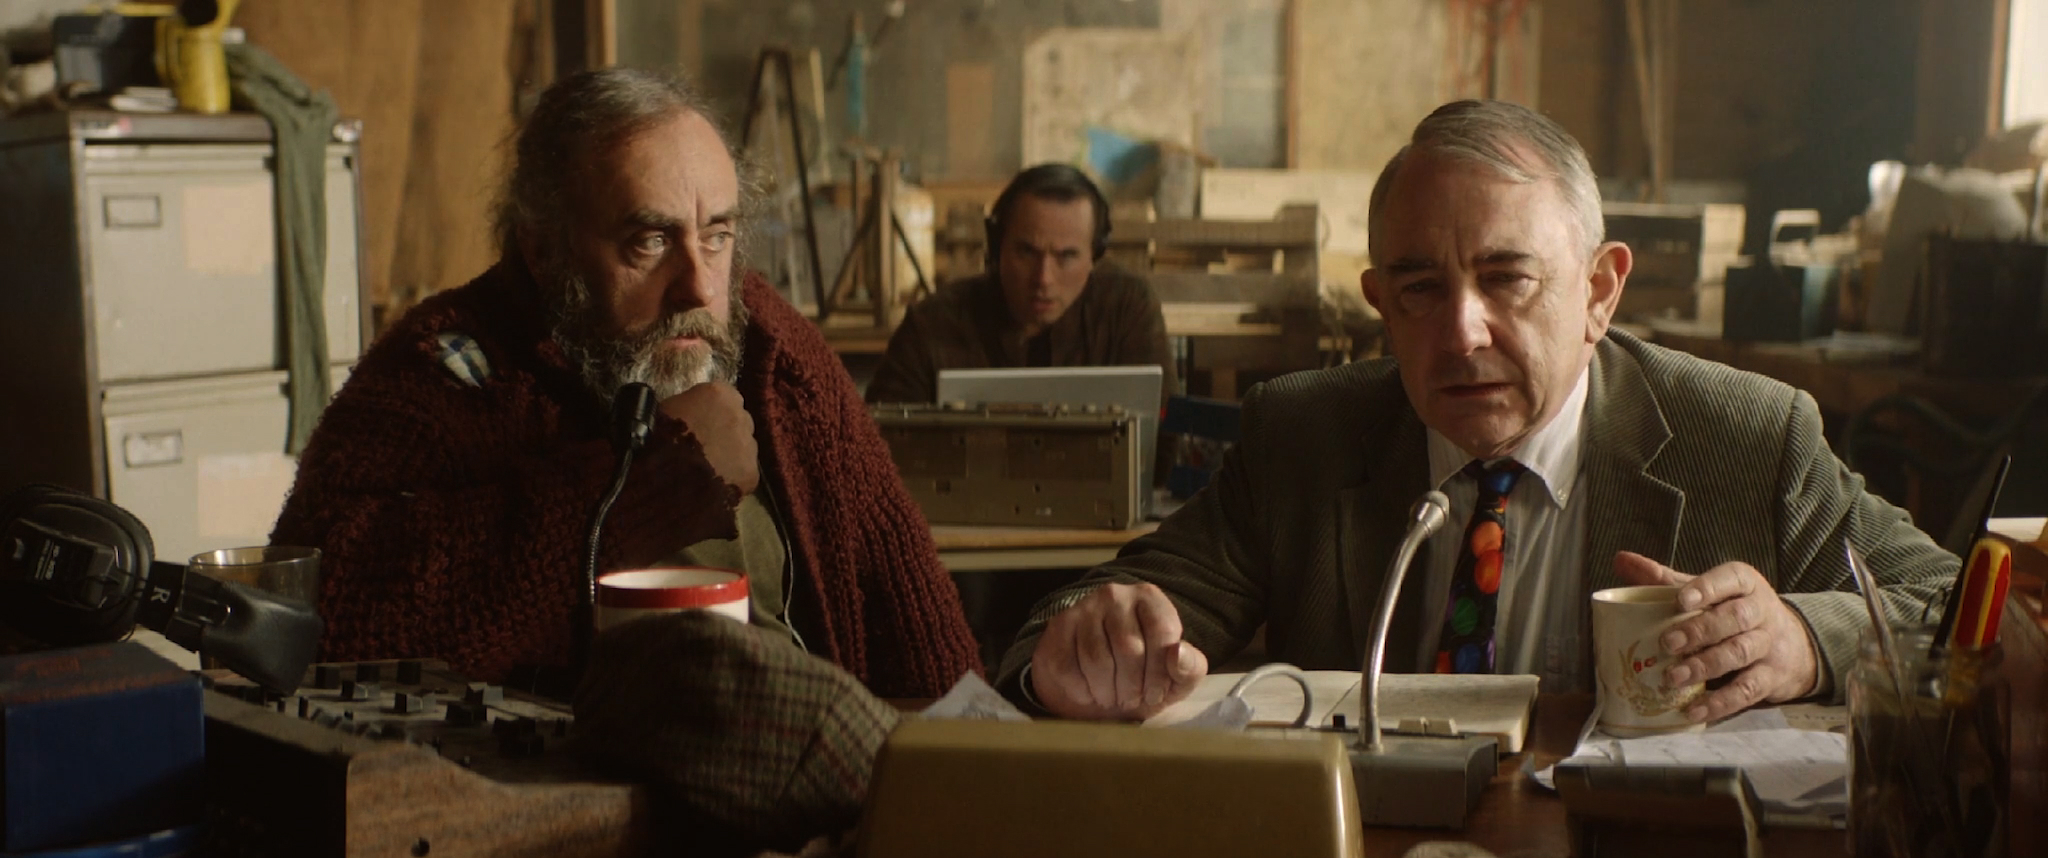 Short-film 'Radio' wins at Sene